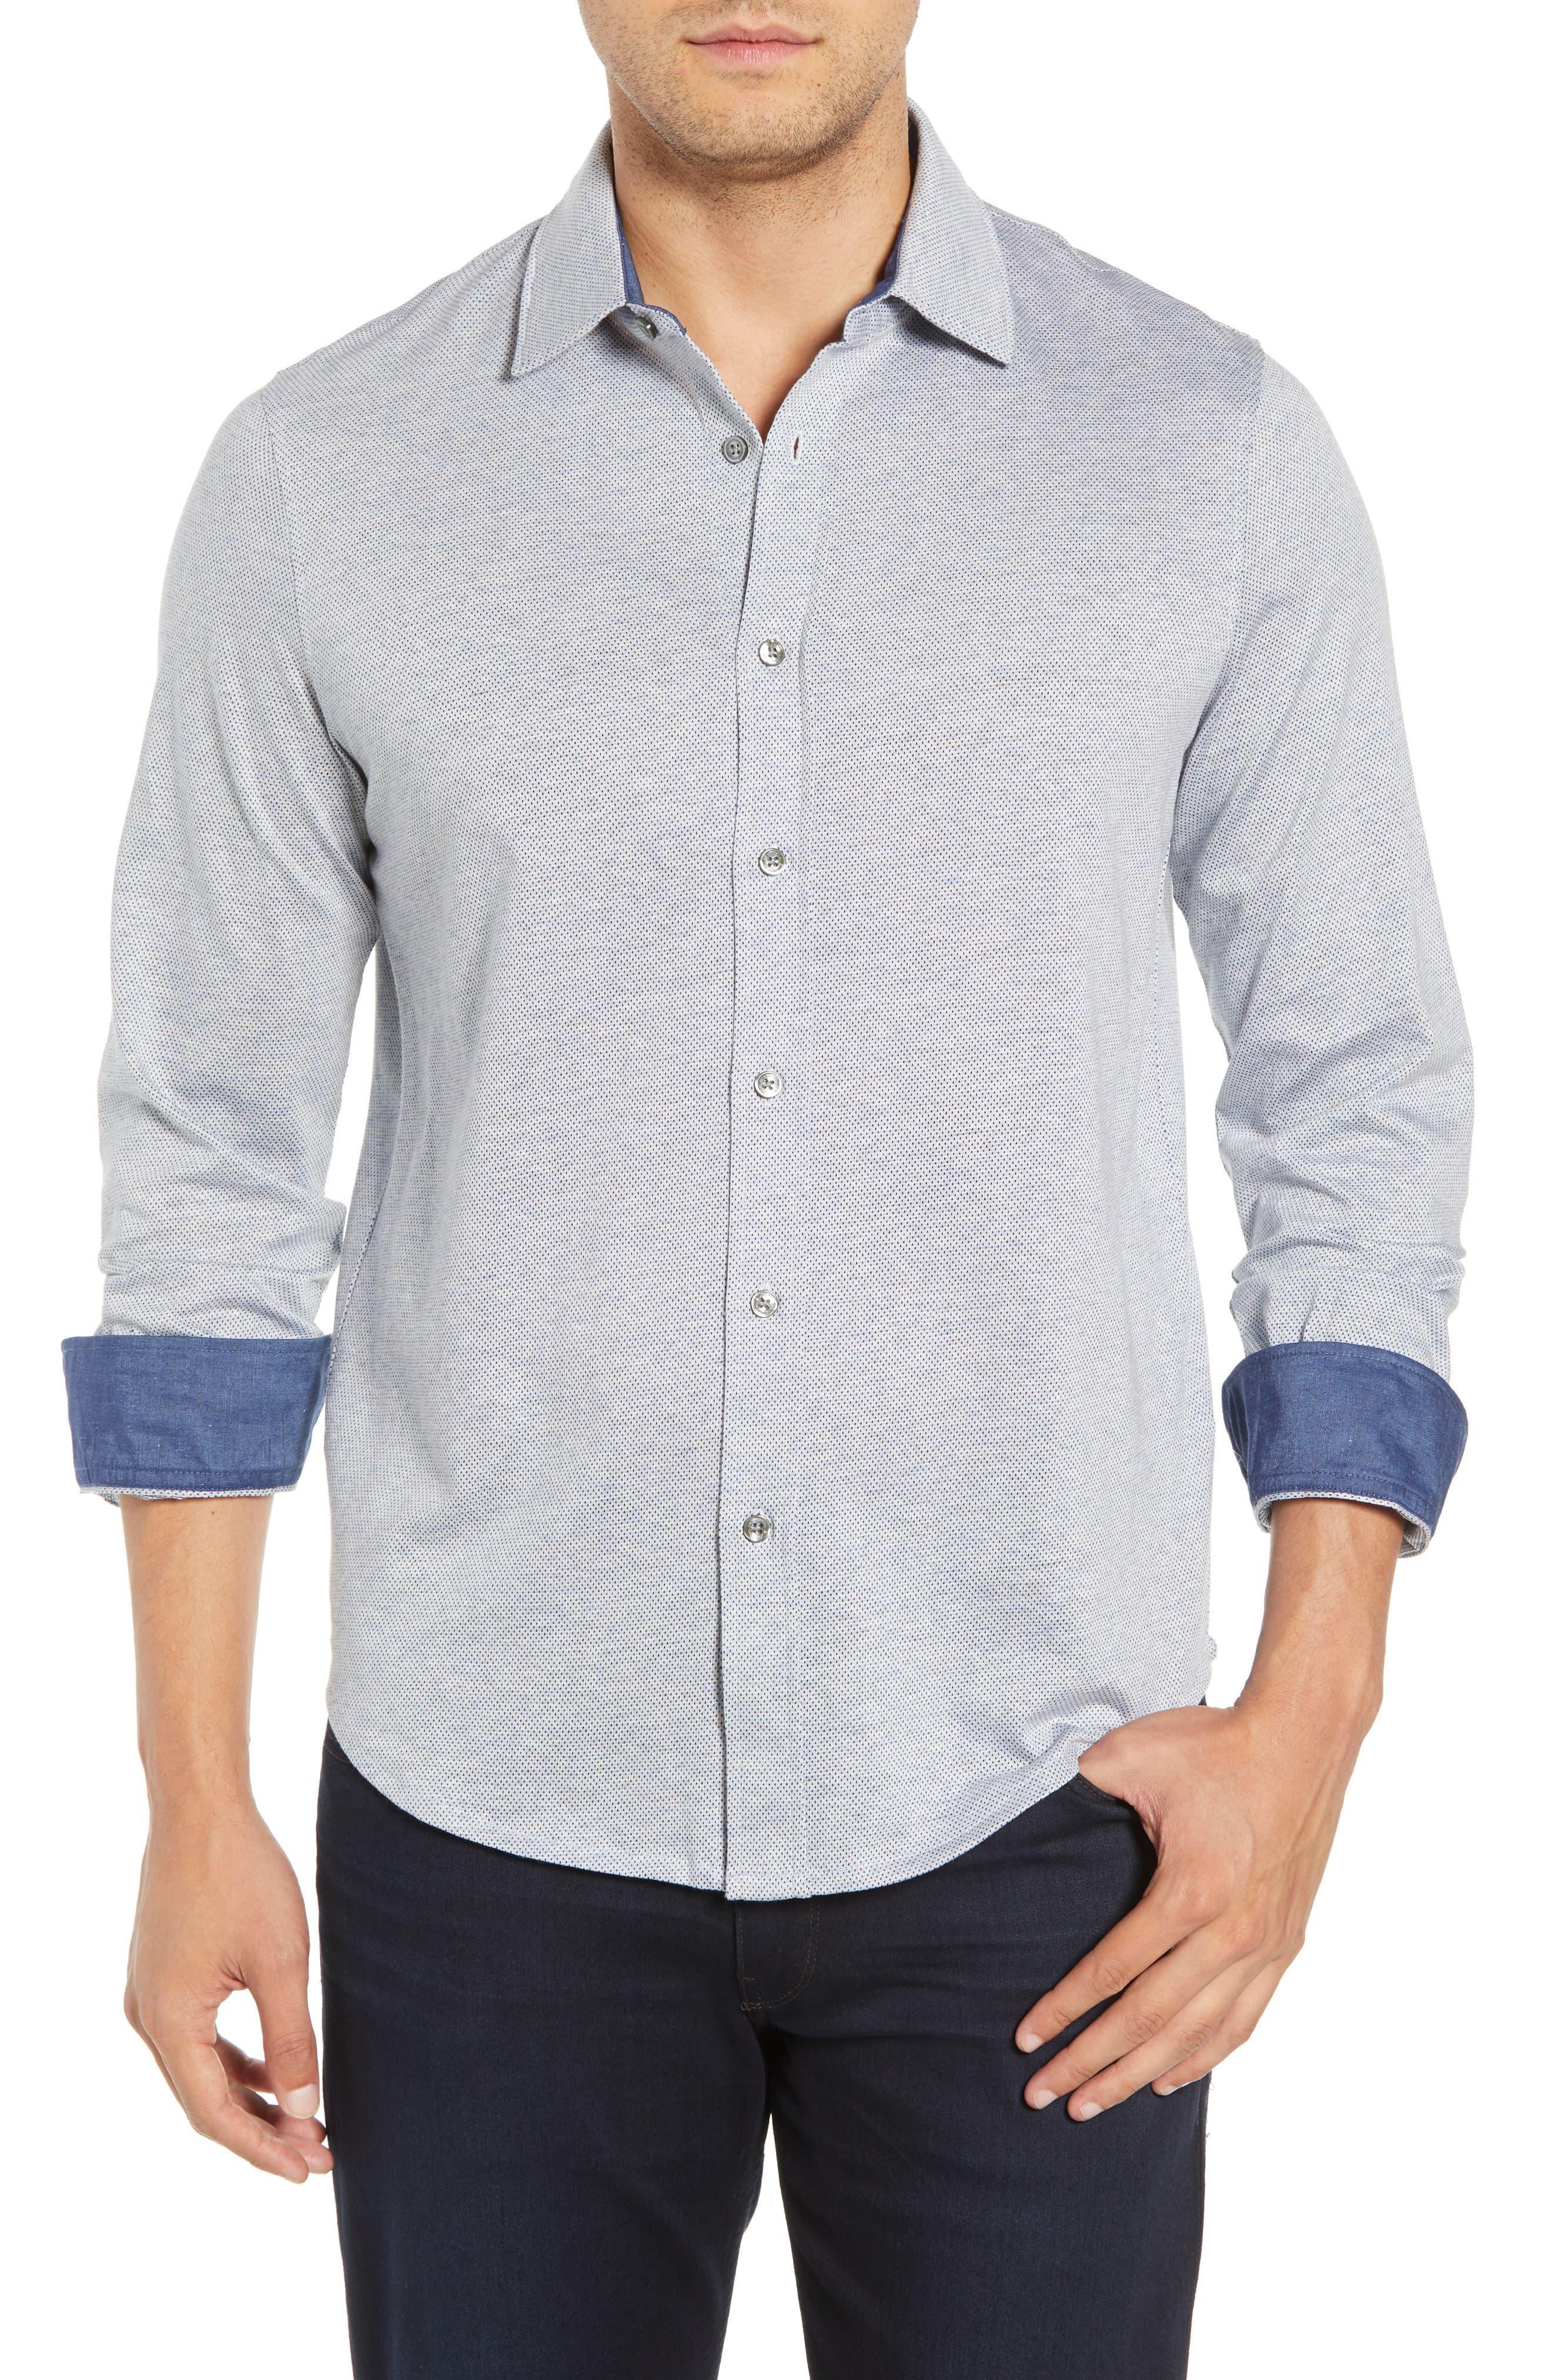 Regular Fit Microdot Knit Sport Shirt,                             Main thumbnail 1, color,                             AIR BLUE